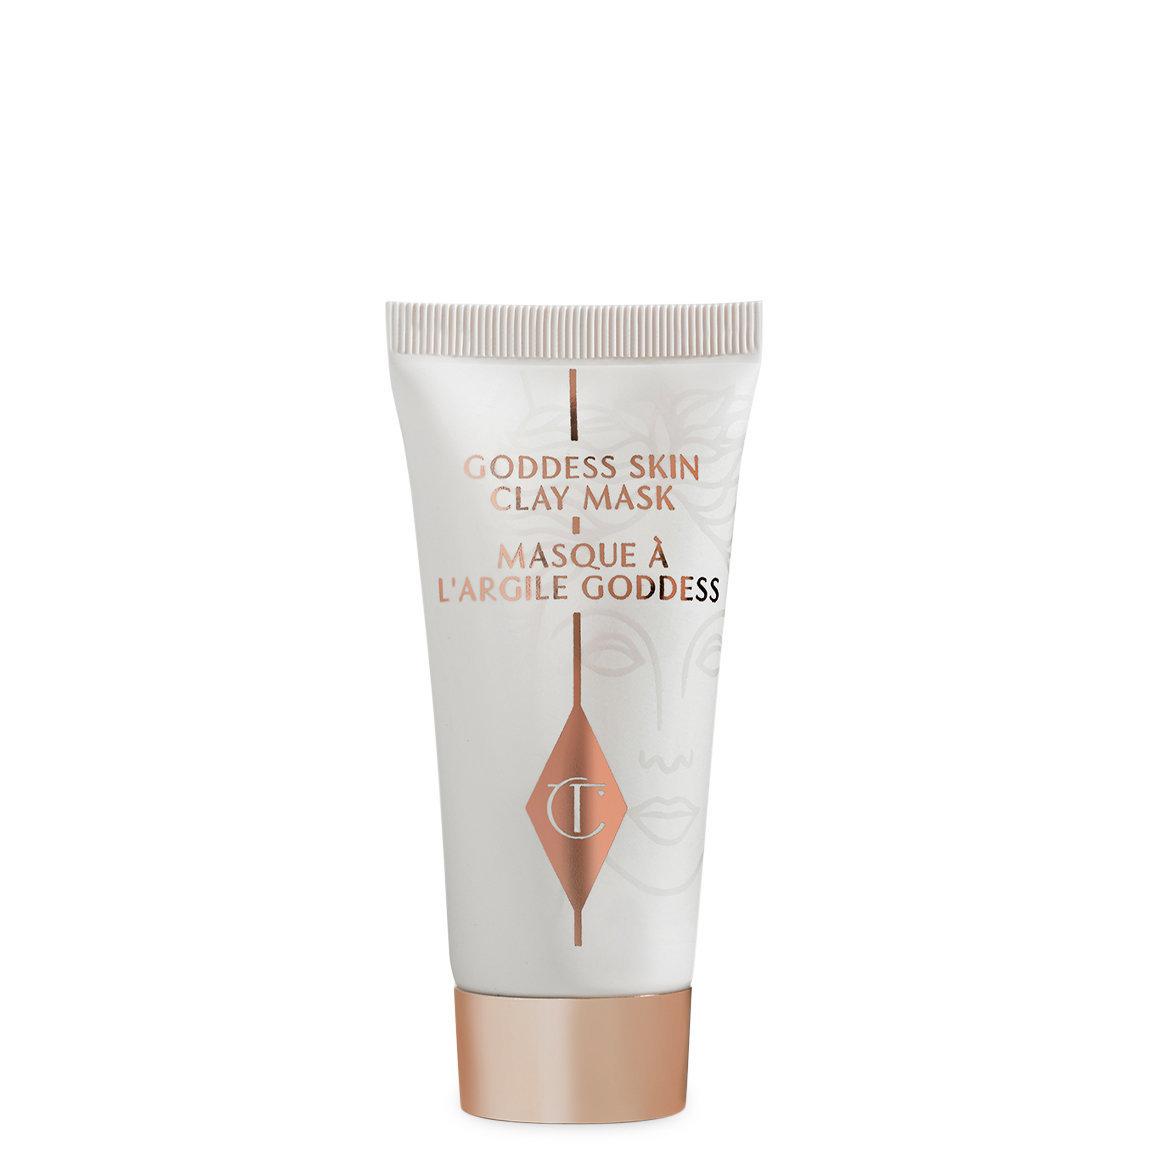 Charlotte Tilbury Goddess Skin Clay Mask Travel Size alternative view 1 - product swatch.